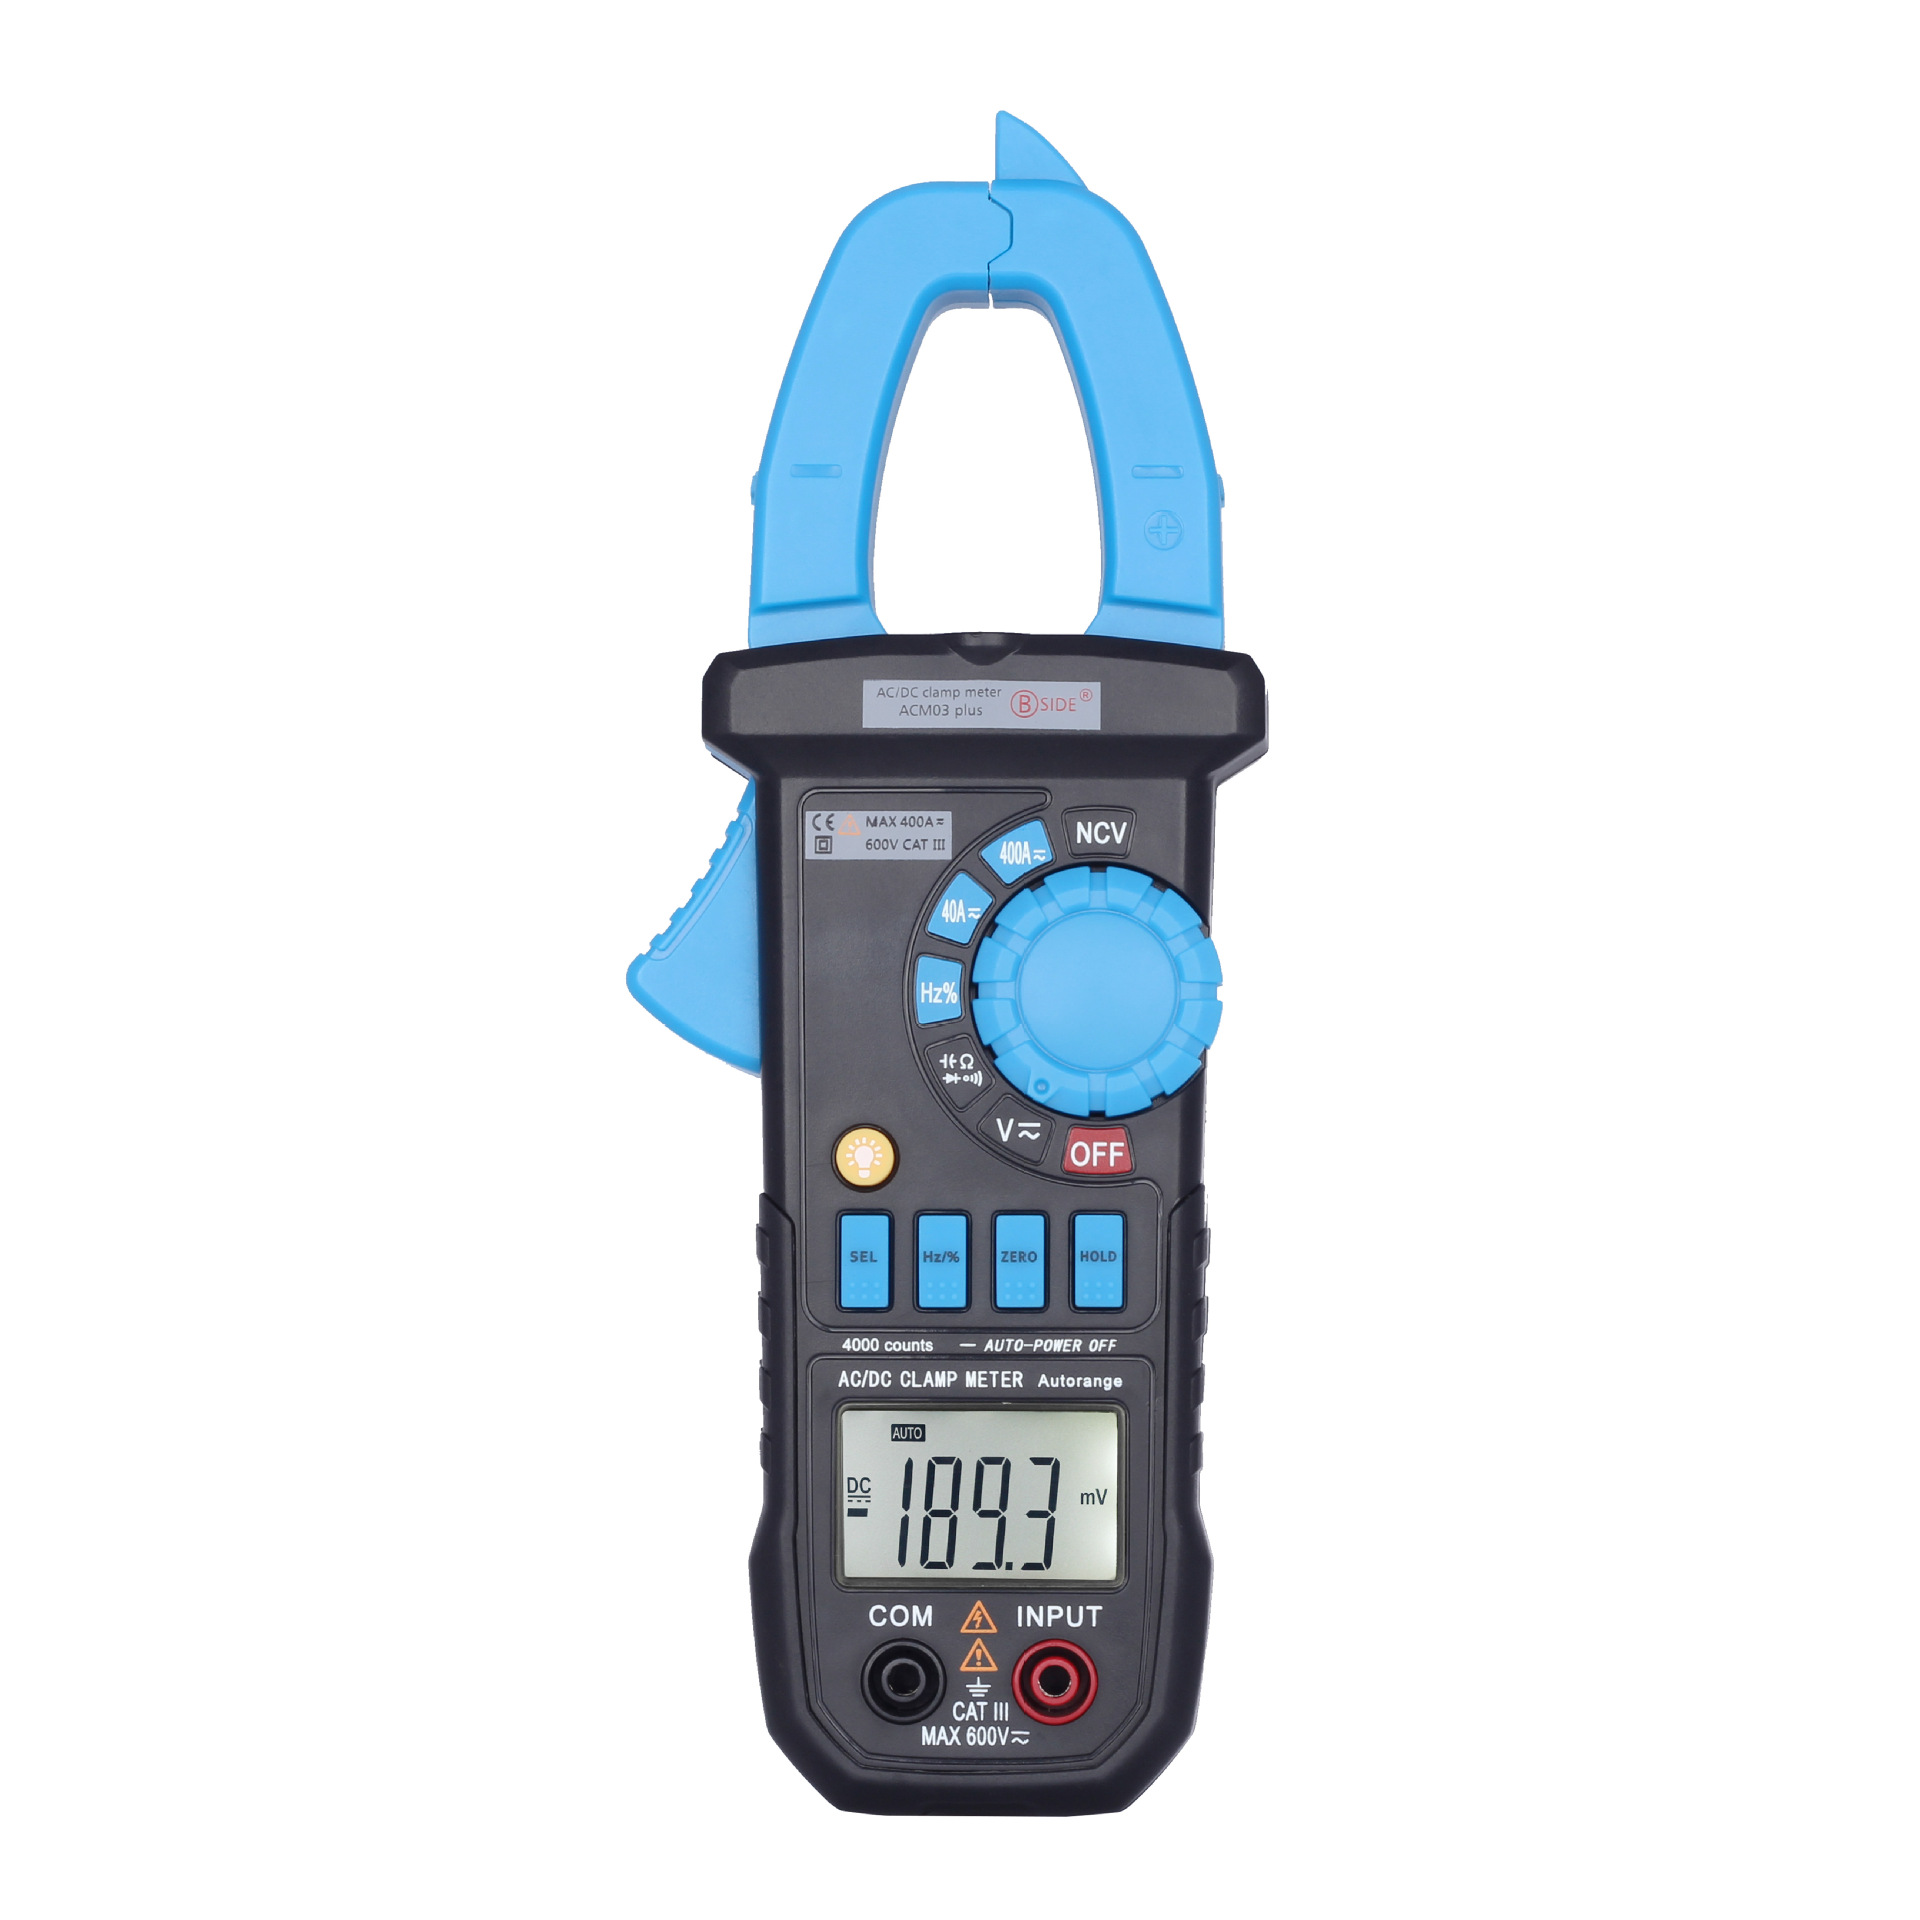 ACM03 plus Auto Range 400A AC DC Digital Electric Clamp Meter voltmeter Multimeter NCV Frequency Capacitance Tester VS UT203 цены онлайн